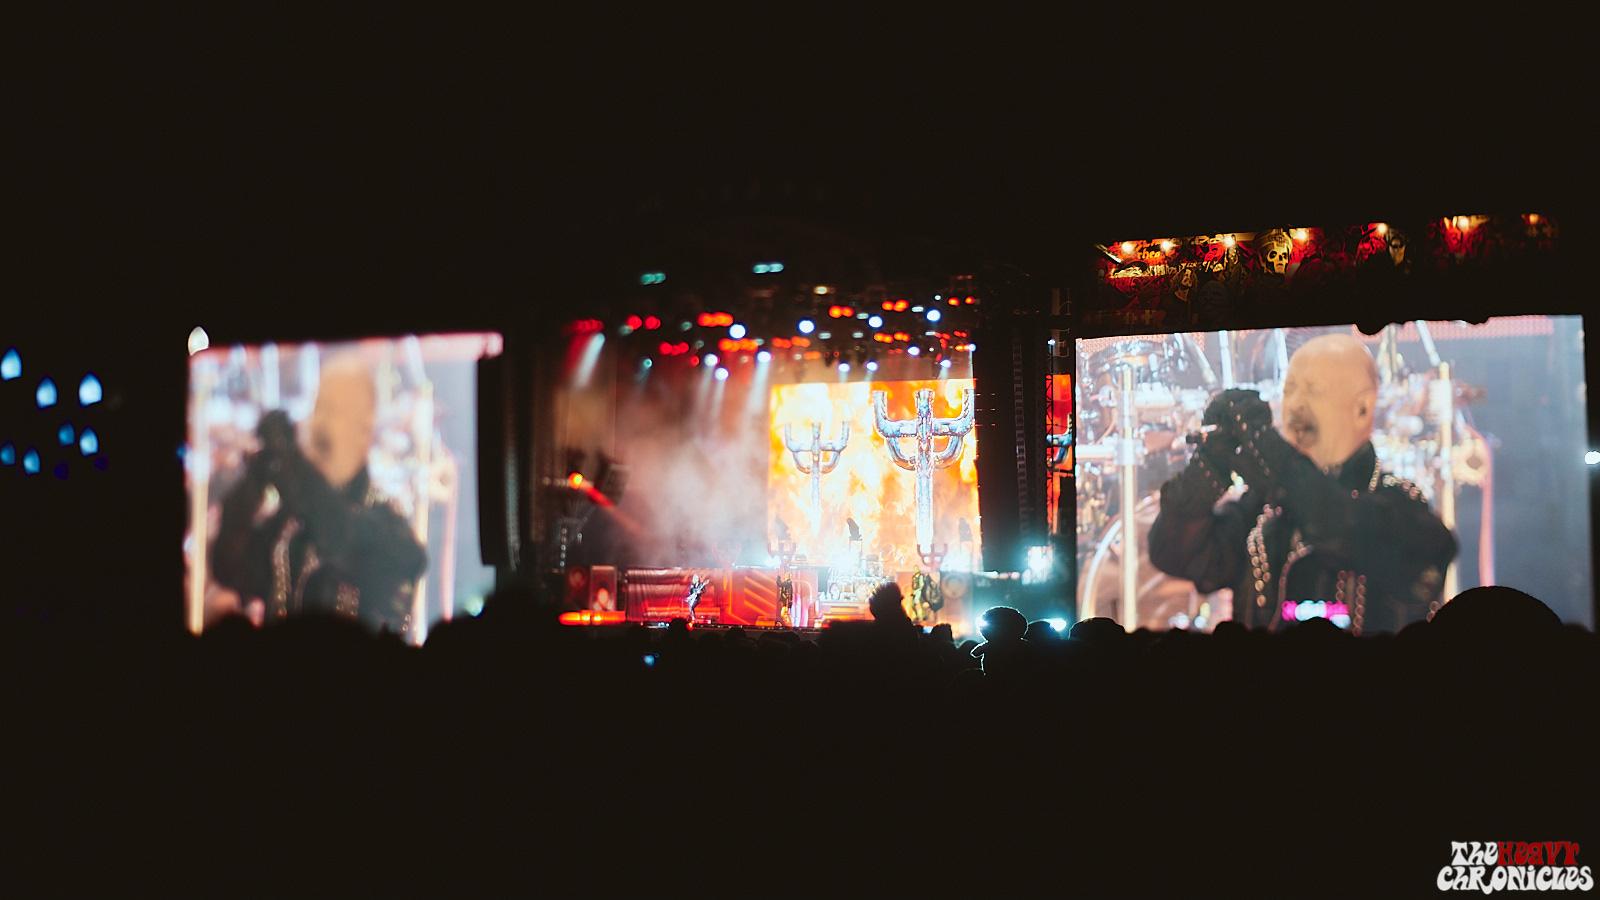 Judas-Priest-Hellfest-2018 52